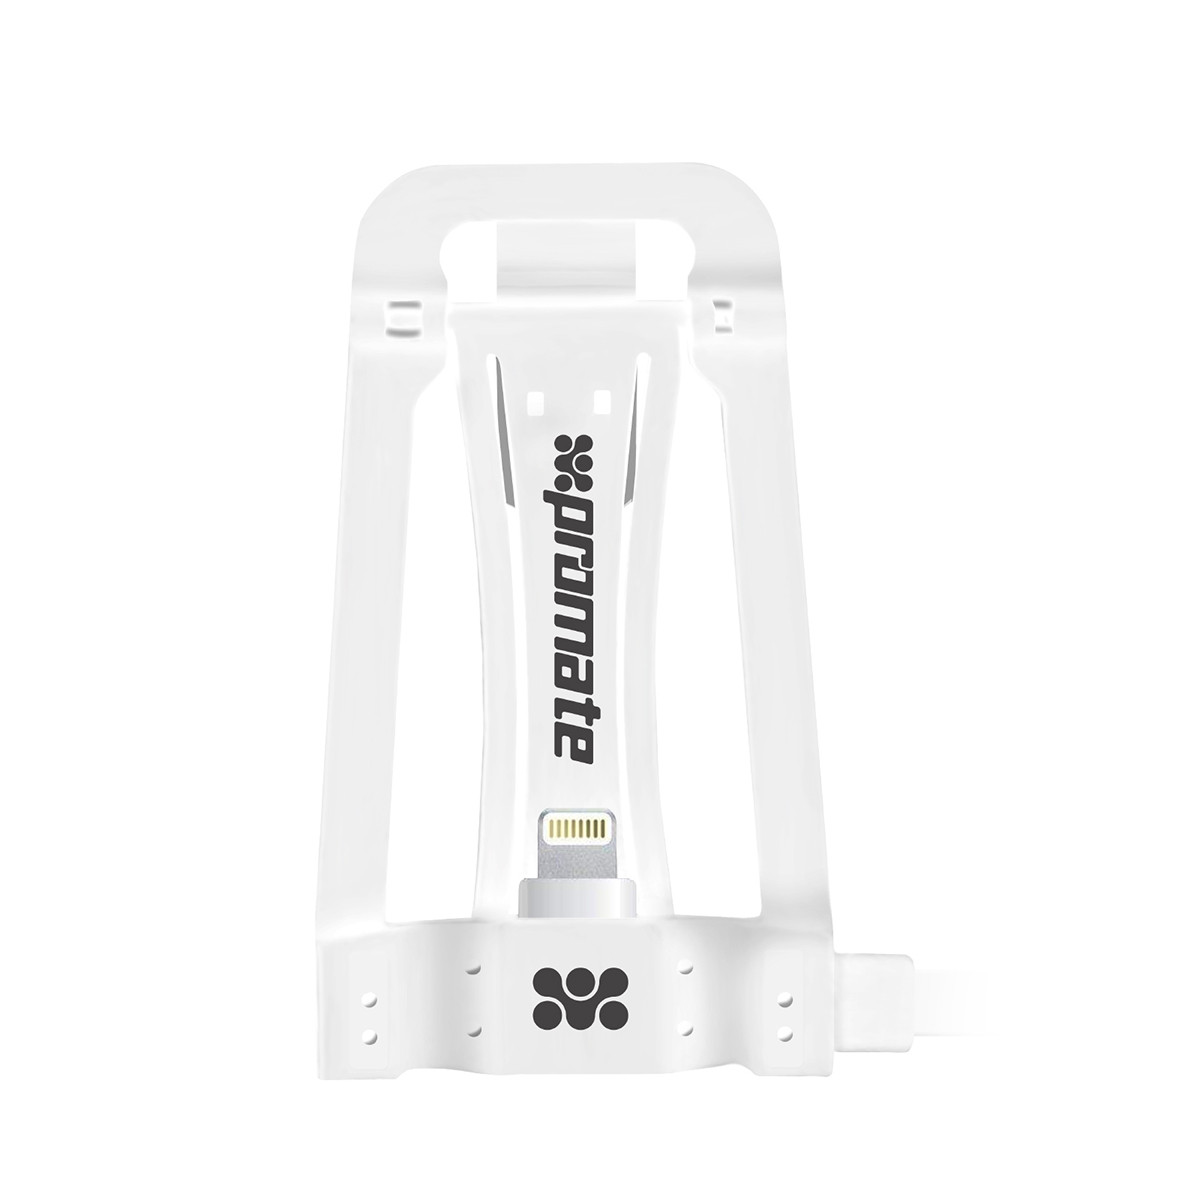 Кабель c подставкой Promate Pose-LT Lightning-USB 1.15 м White